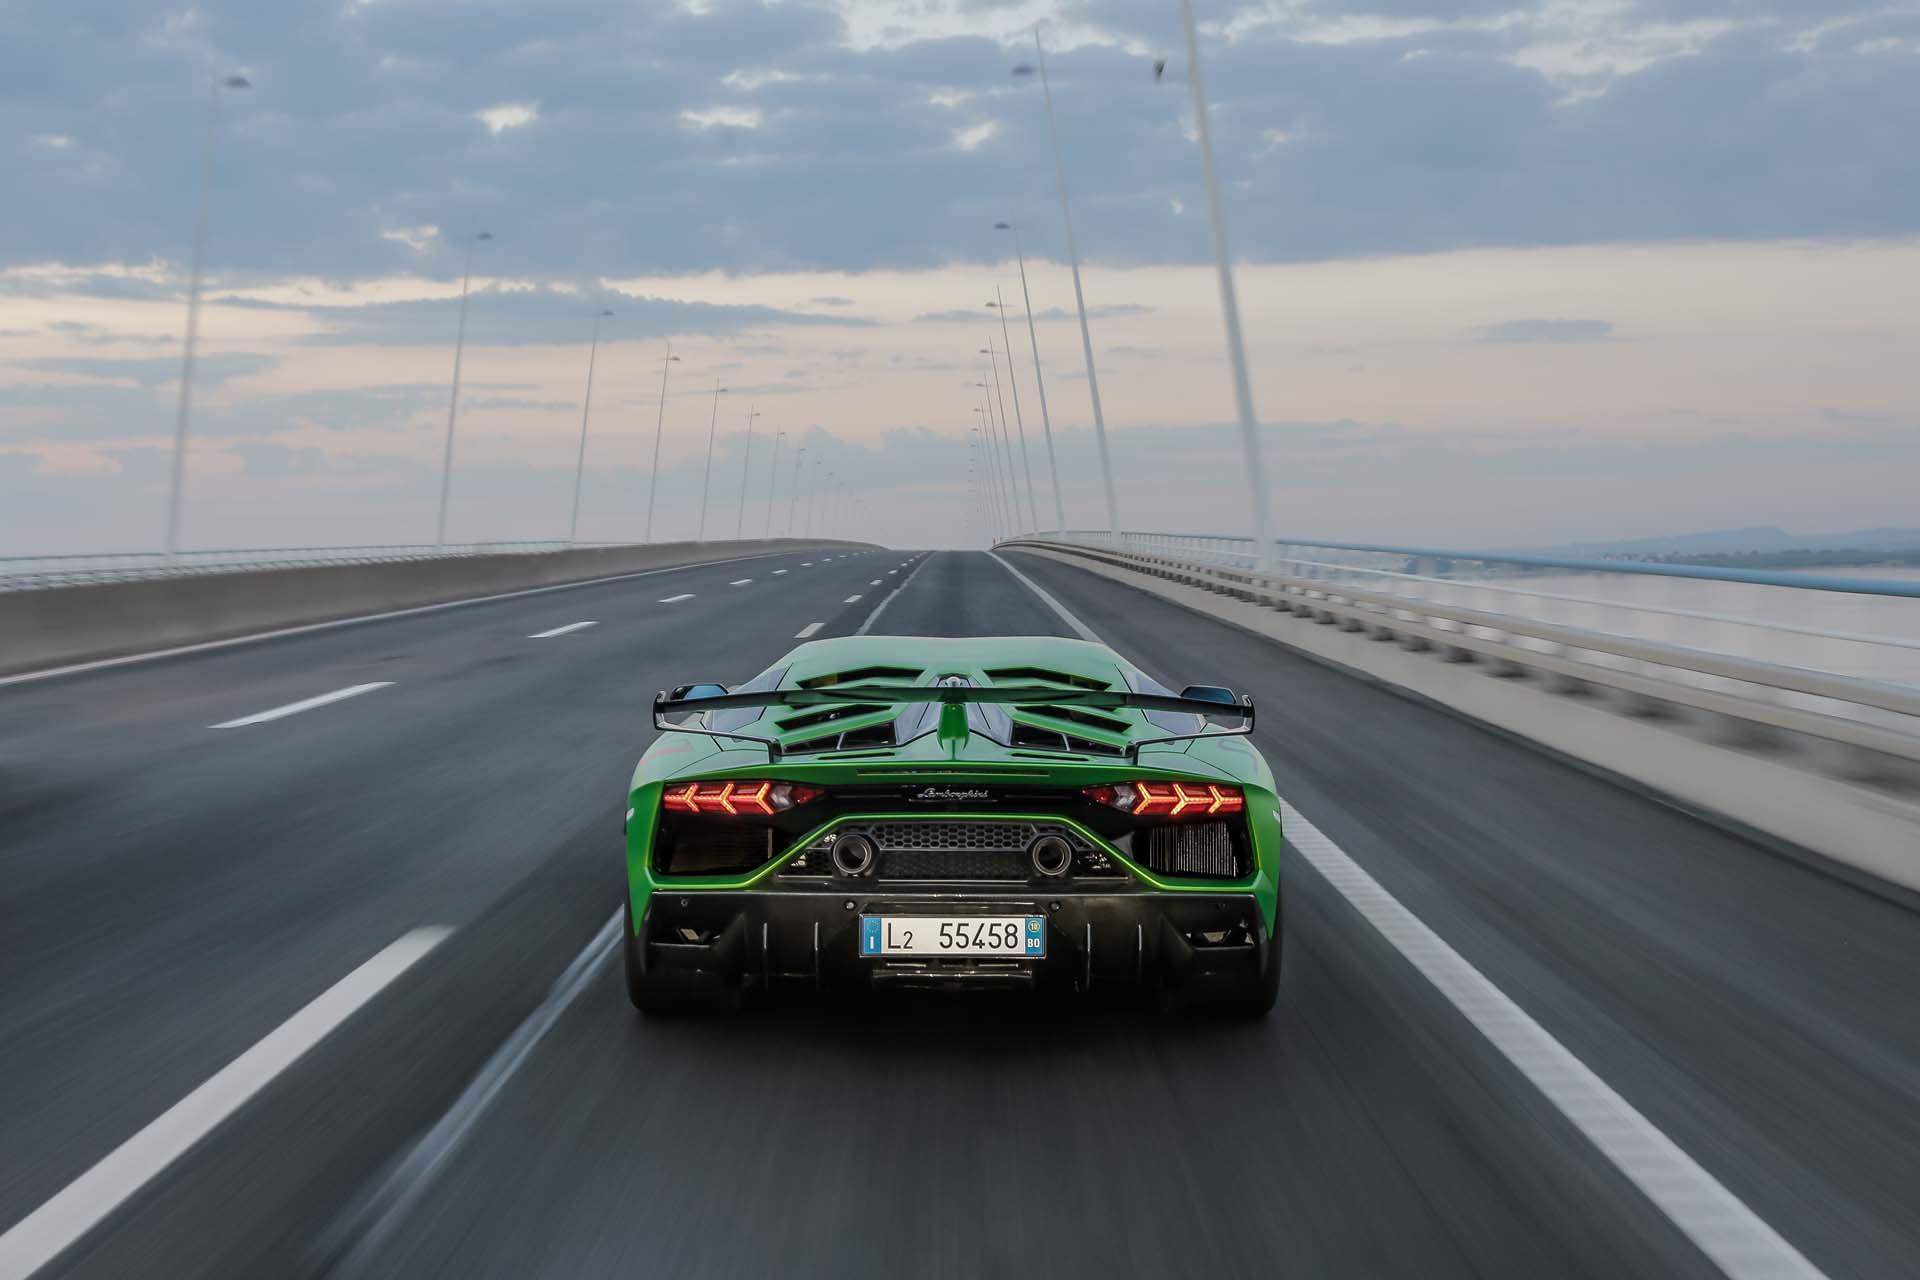 2019 Lamborghini Aventador SVJ Rear Wallpapers #50 of 241